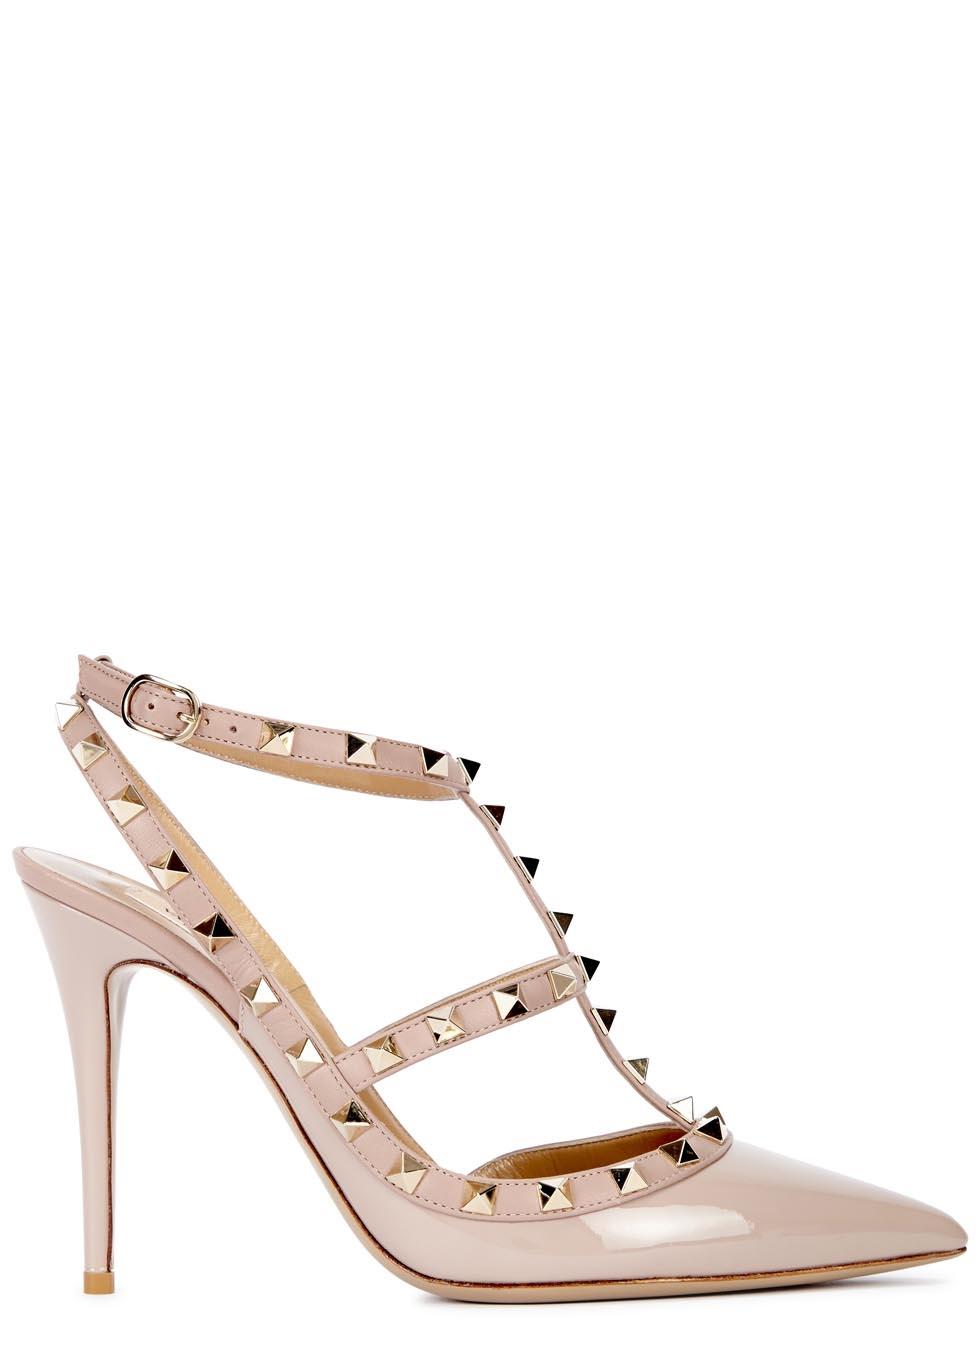 6f52ddfaeca Valentino Rockstud 100 blush patent leather pumps